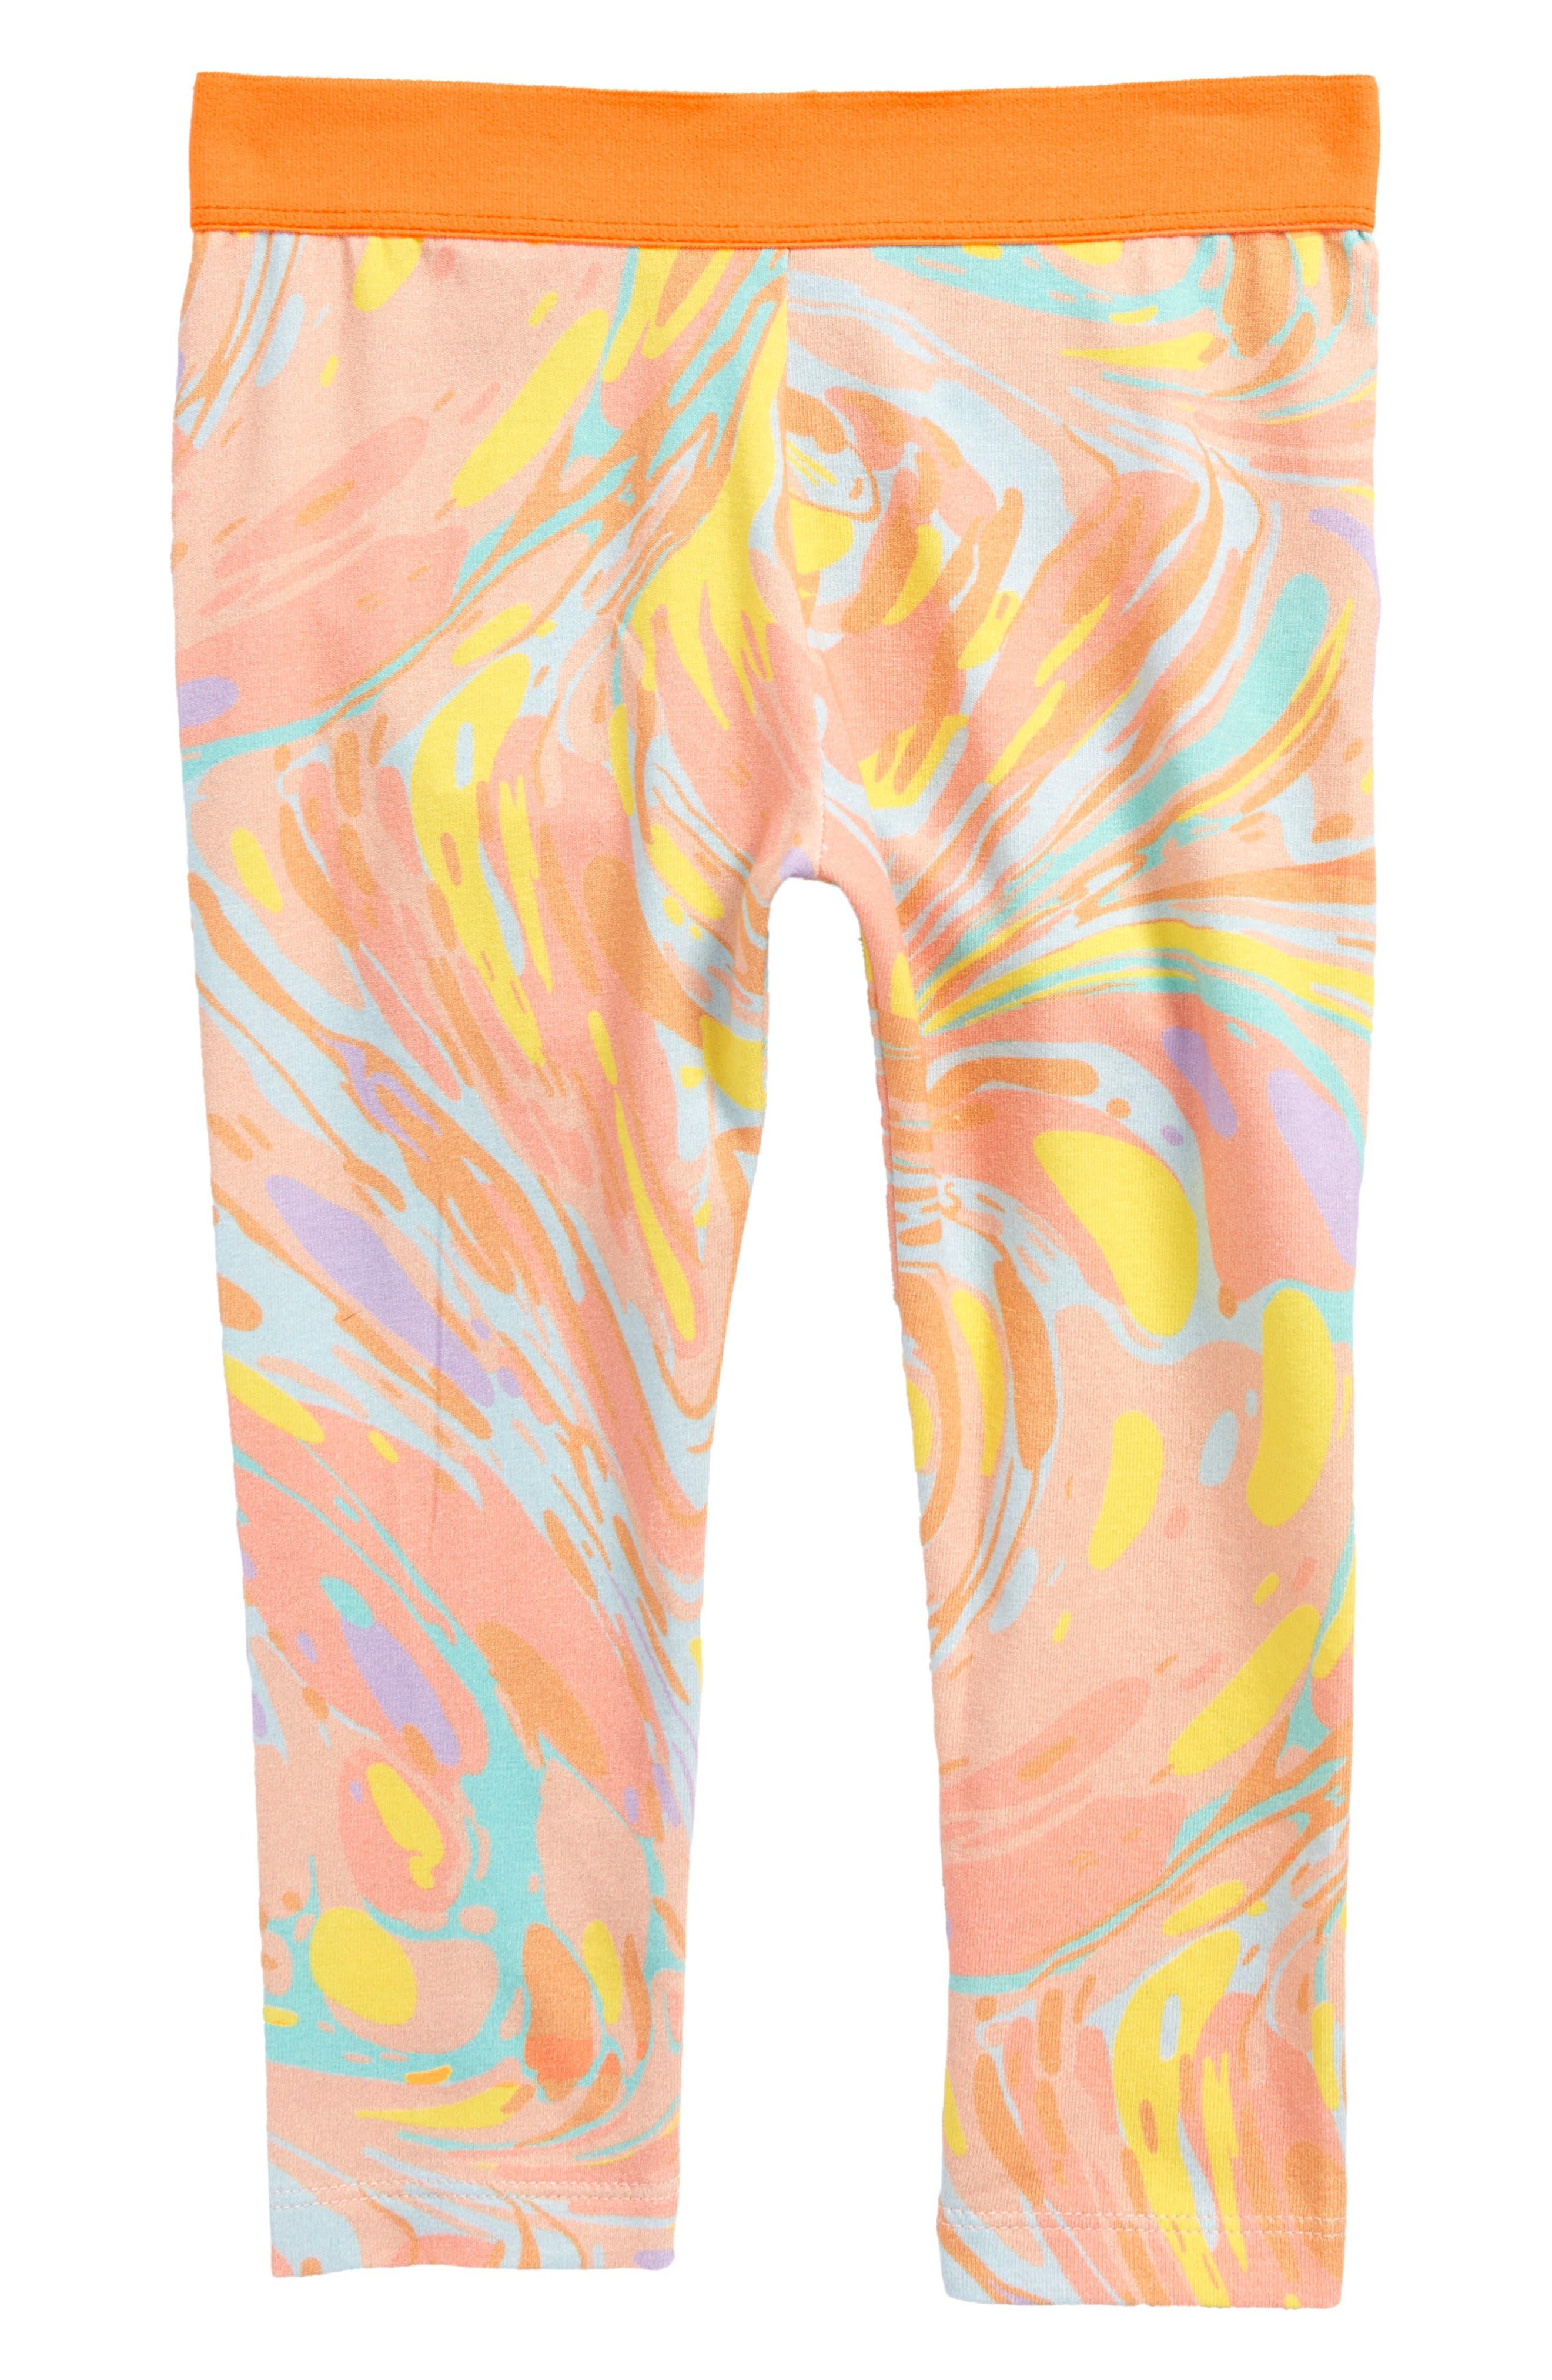 Tula Marble Print Leggings,                             Main thumbnail 1, color,                             Splatter Print